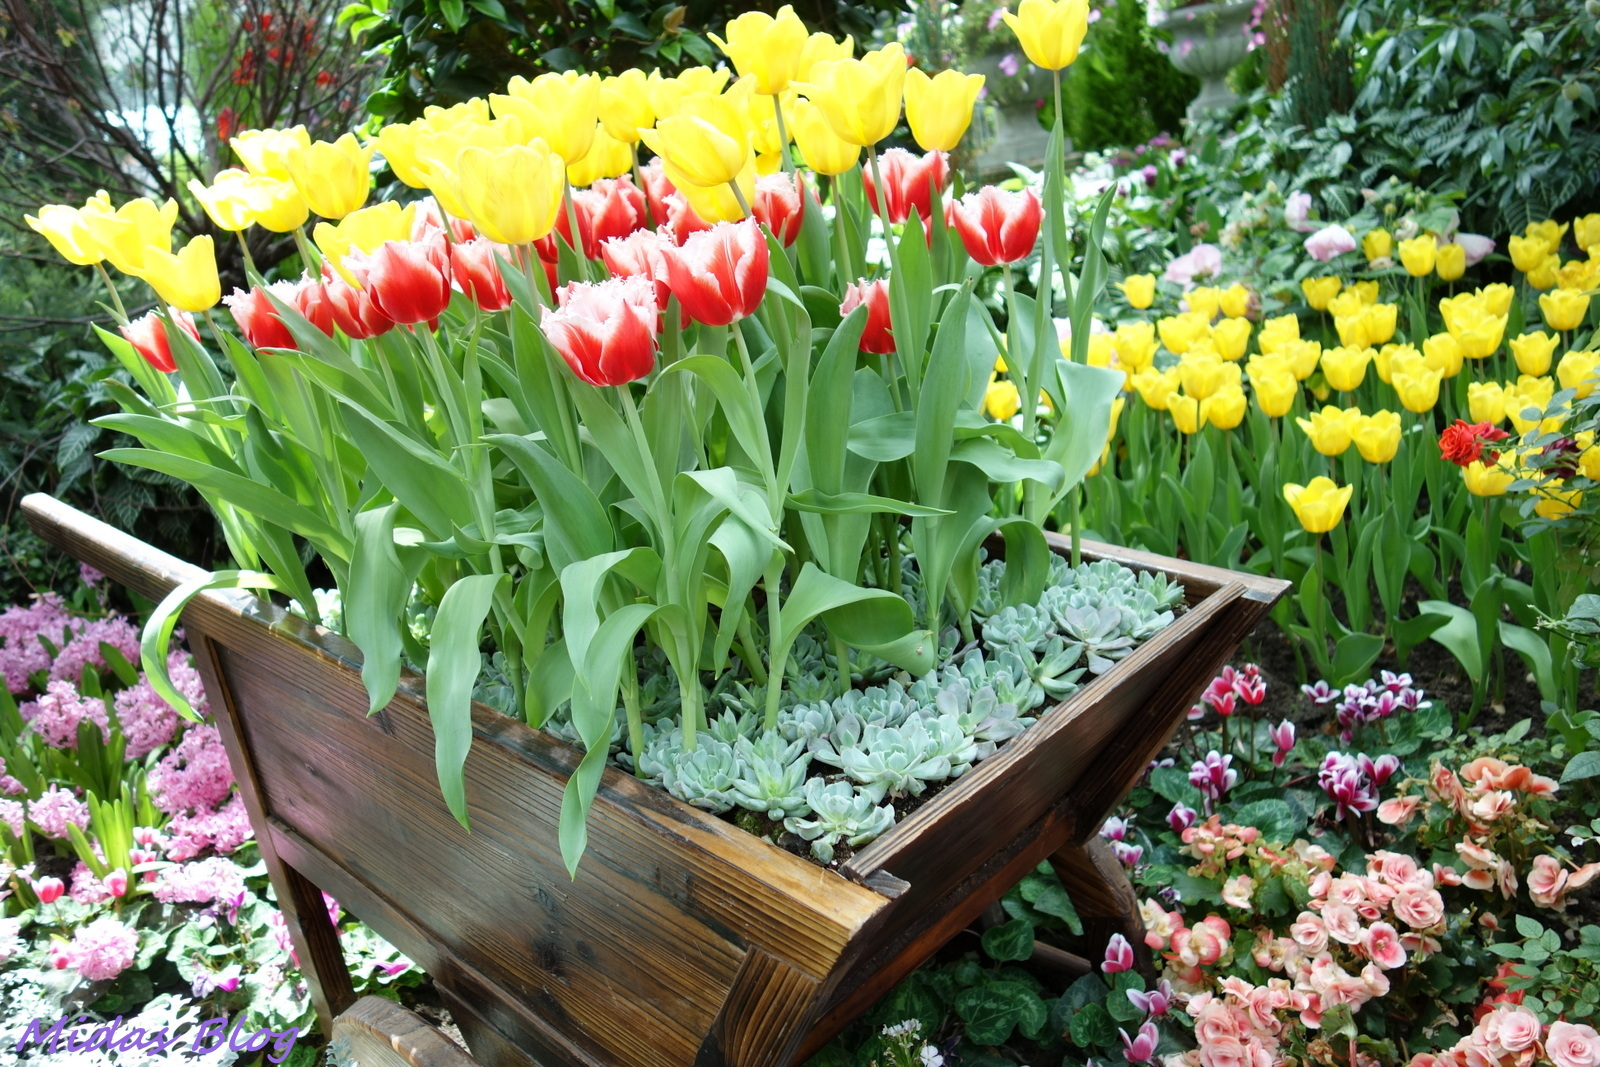 Garden By The Bay Aircon midas food n travel blog: tulipmania @gardensthe bay